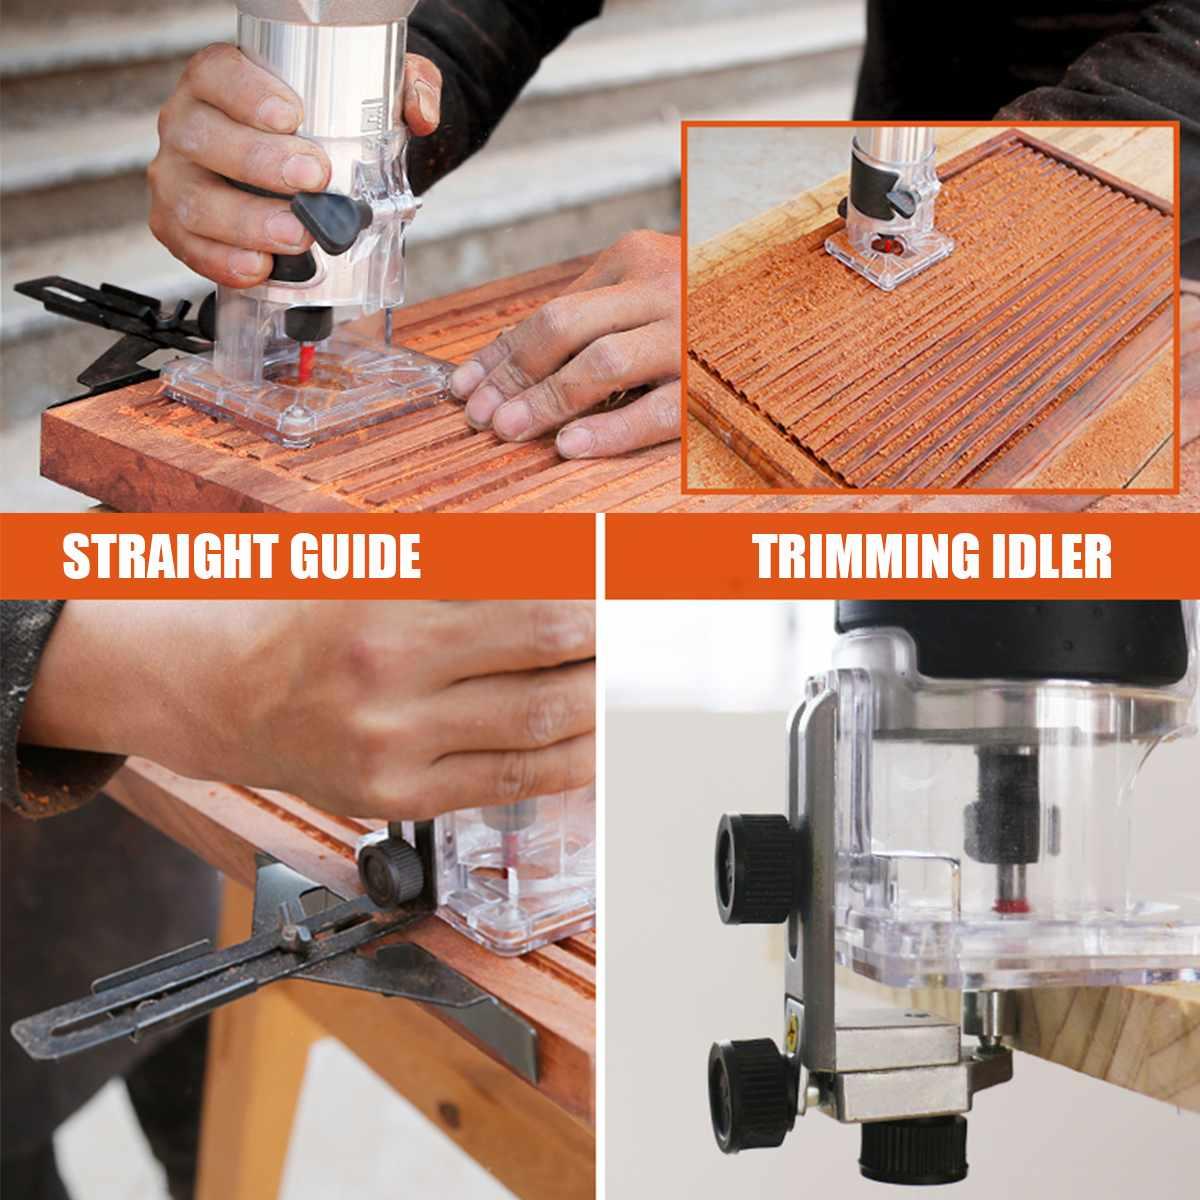 2200W Elektrische Hand Trimmer Holz Router 6,35mm Holzbearbeitung Laminator Zimmerei Trimmen Schneiden Carving Maschine Power Tool Set